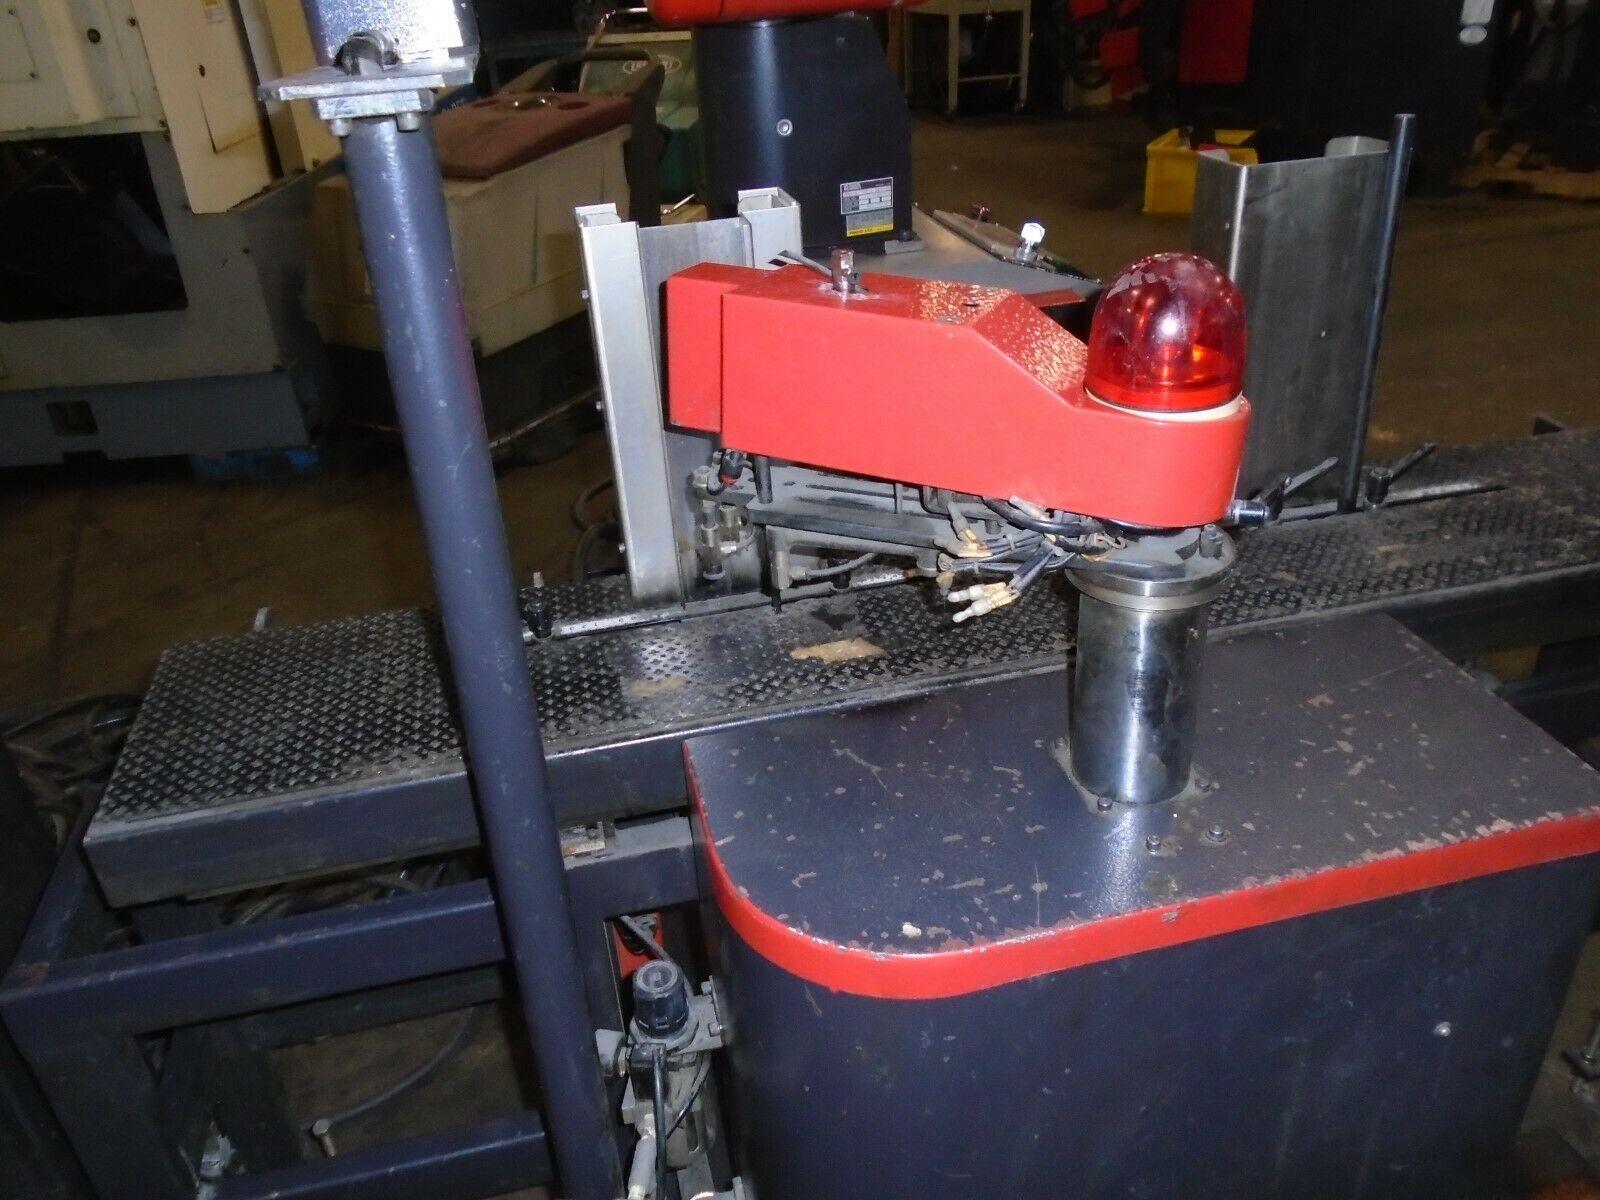 Fanuc Robot LR Mate 100 A5B-1131-8001 Mini Cel R-J2 Control - Image 10 of 12